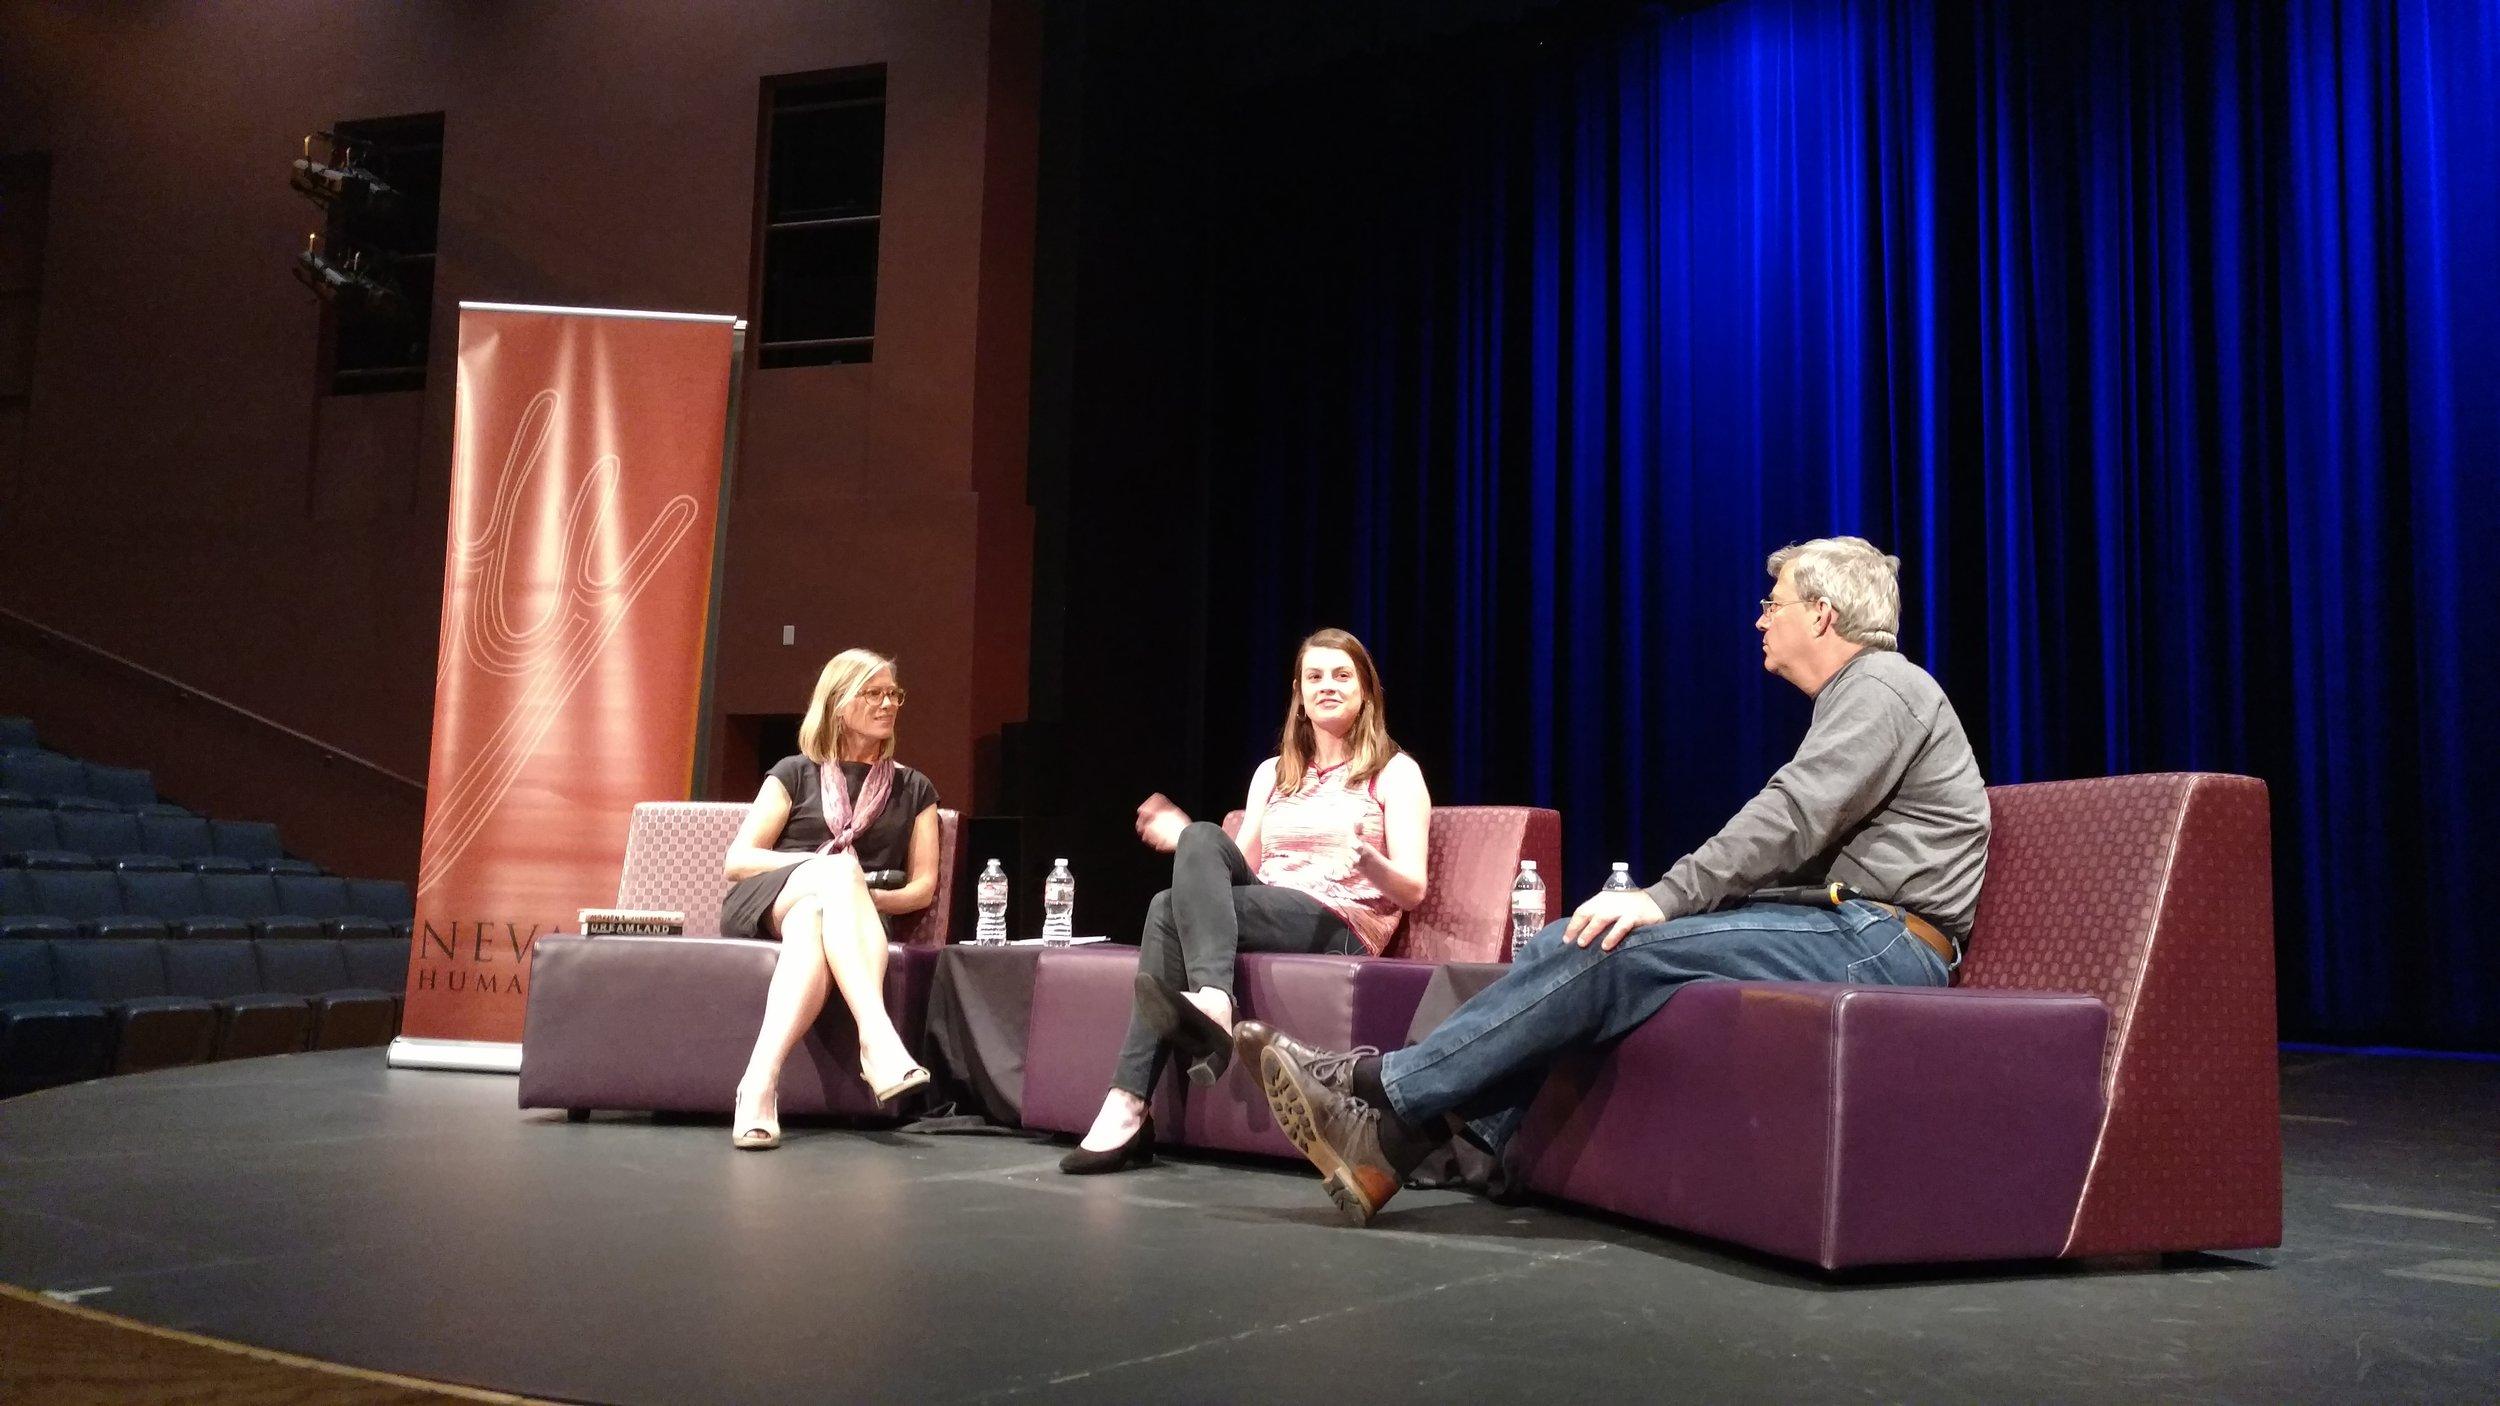 Julie Buntin and Sam Quinones in conversation, Las Vegas 2018.jpg